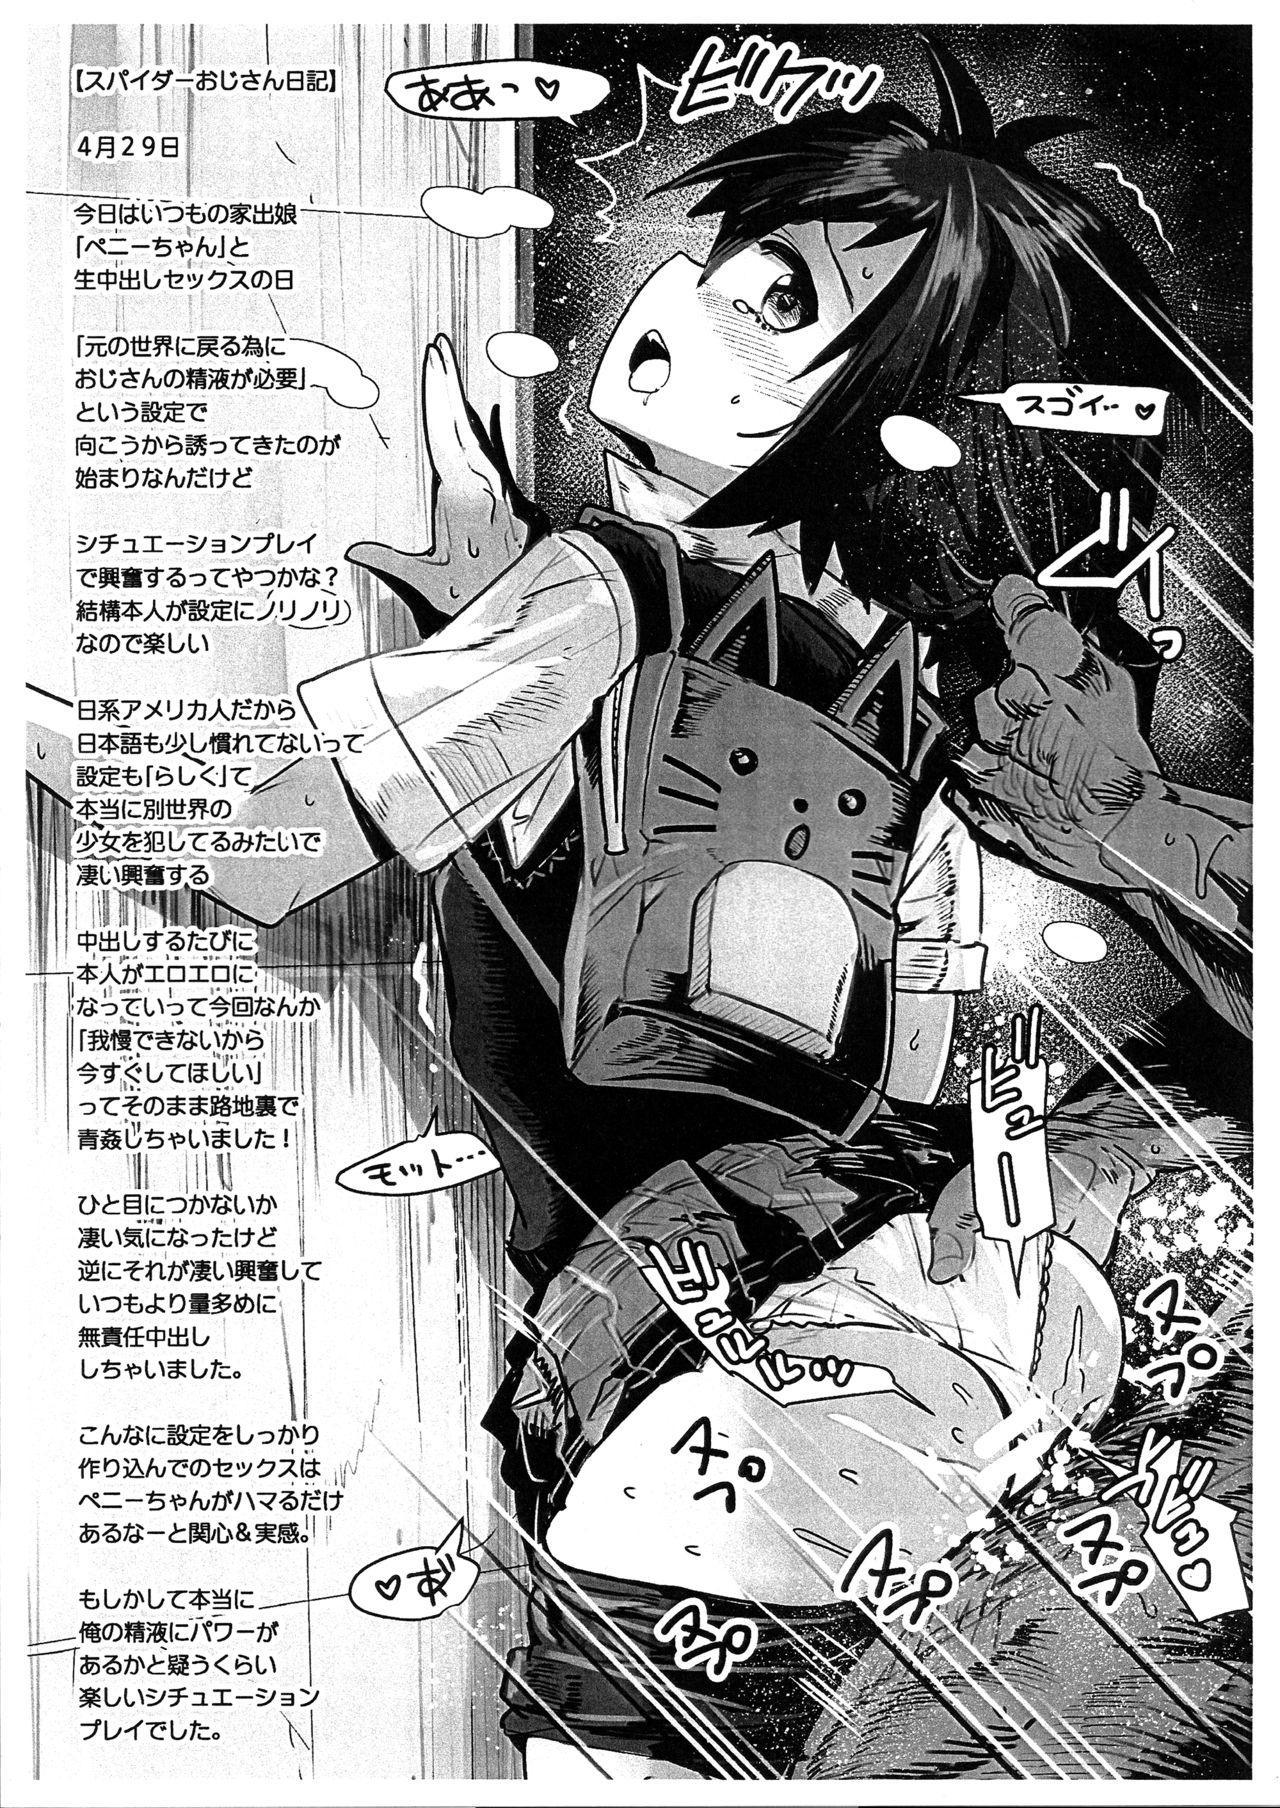 Peni Parker no Usui Hon ni wa Ooinaru Sekinin ga Tomonau   Peni Parker's Thin Book Comes with great Responsibility 2